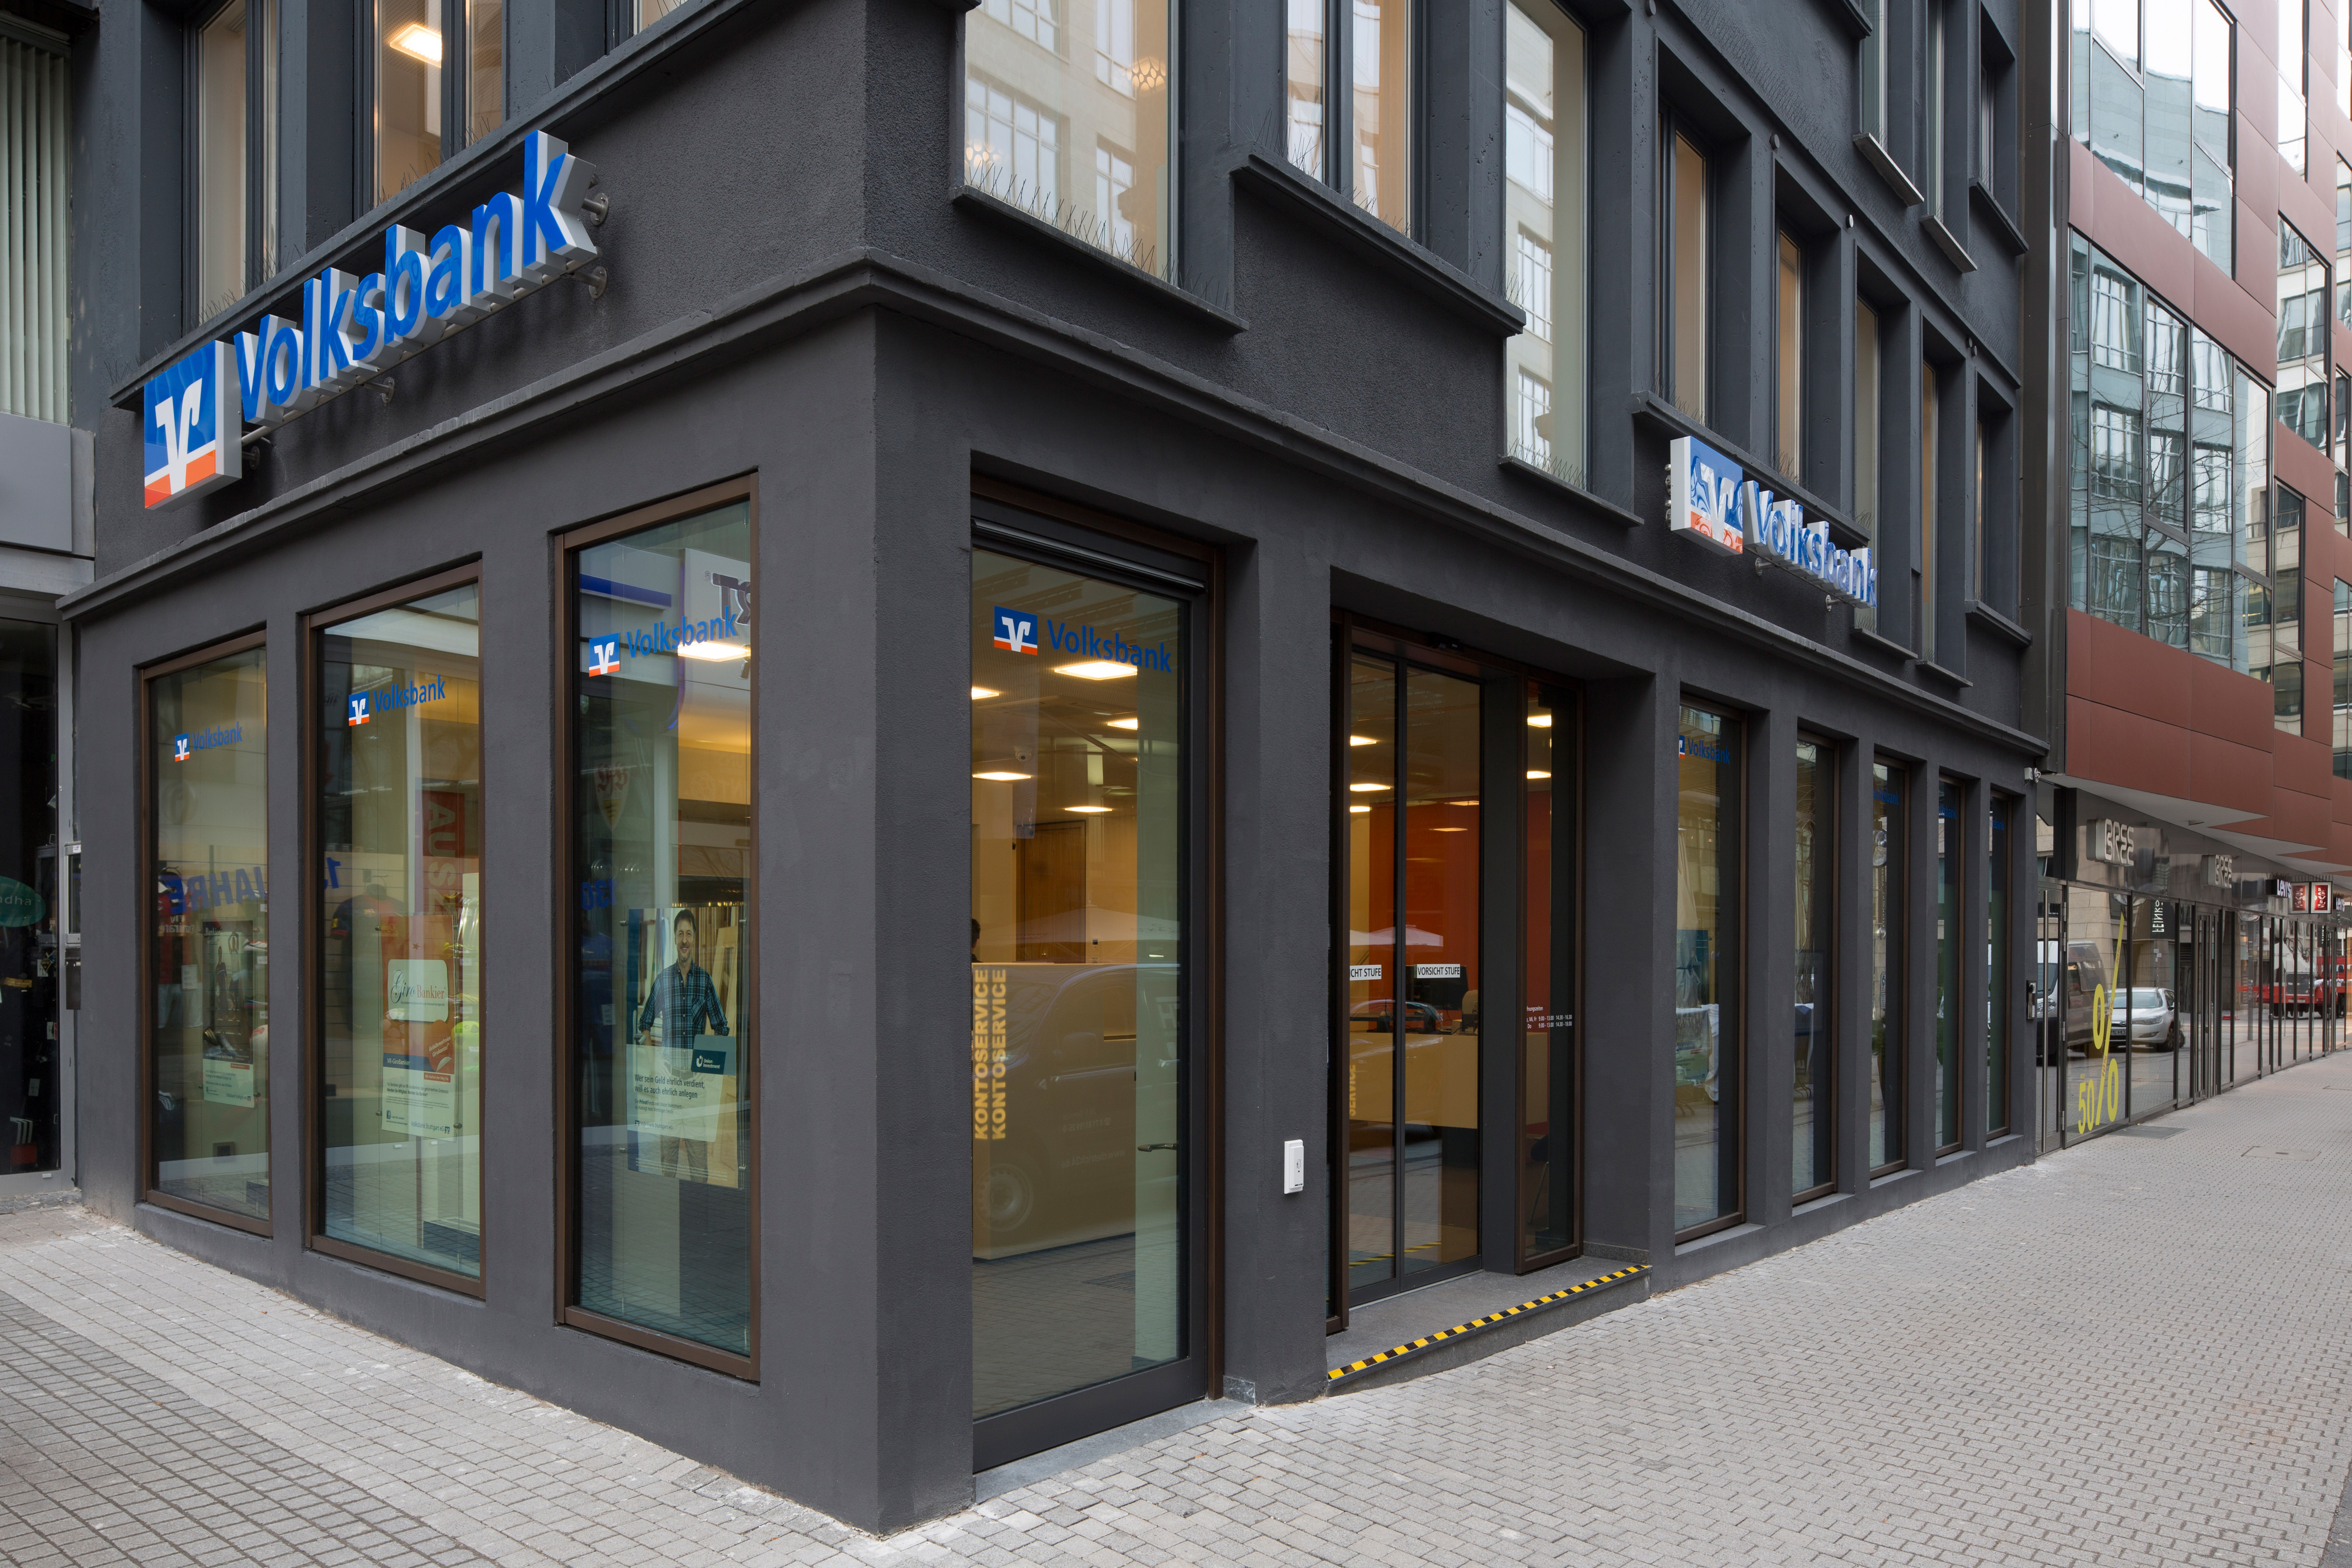 Foto de Volksbank Stuttgart eG Filiale Calwerstraße